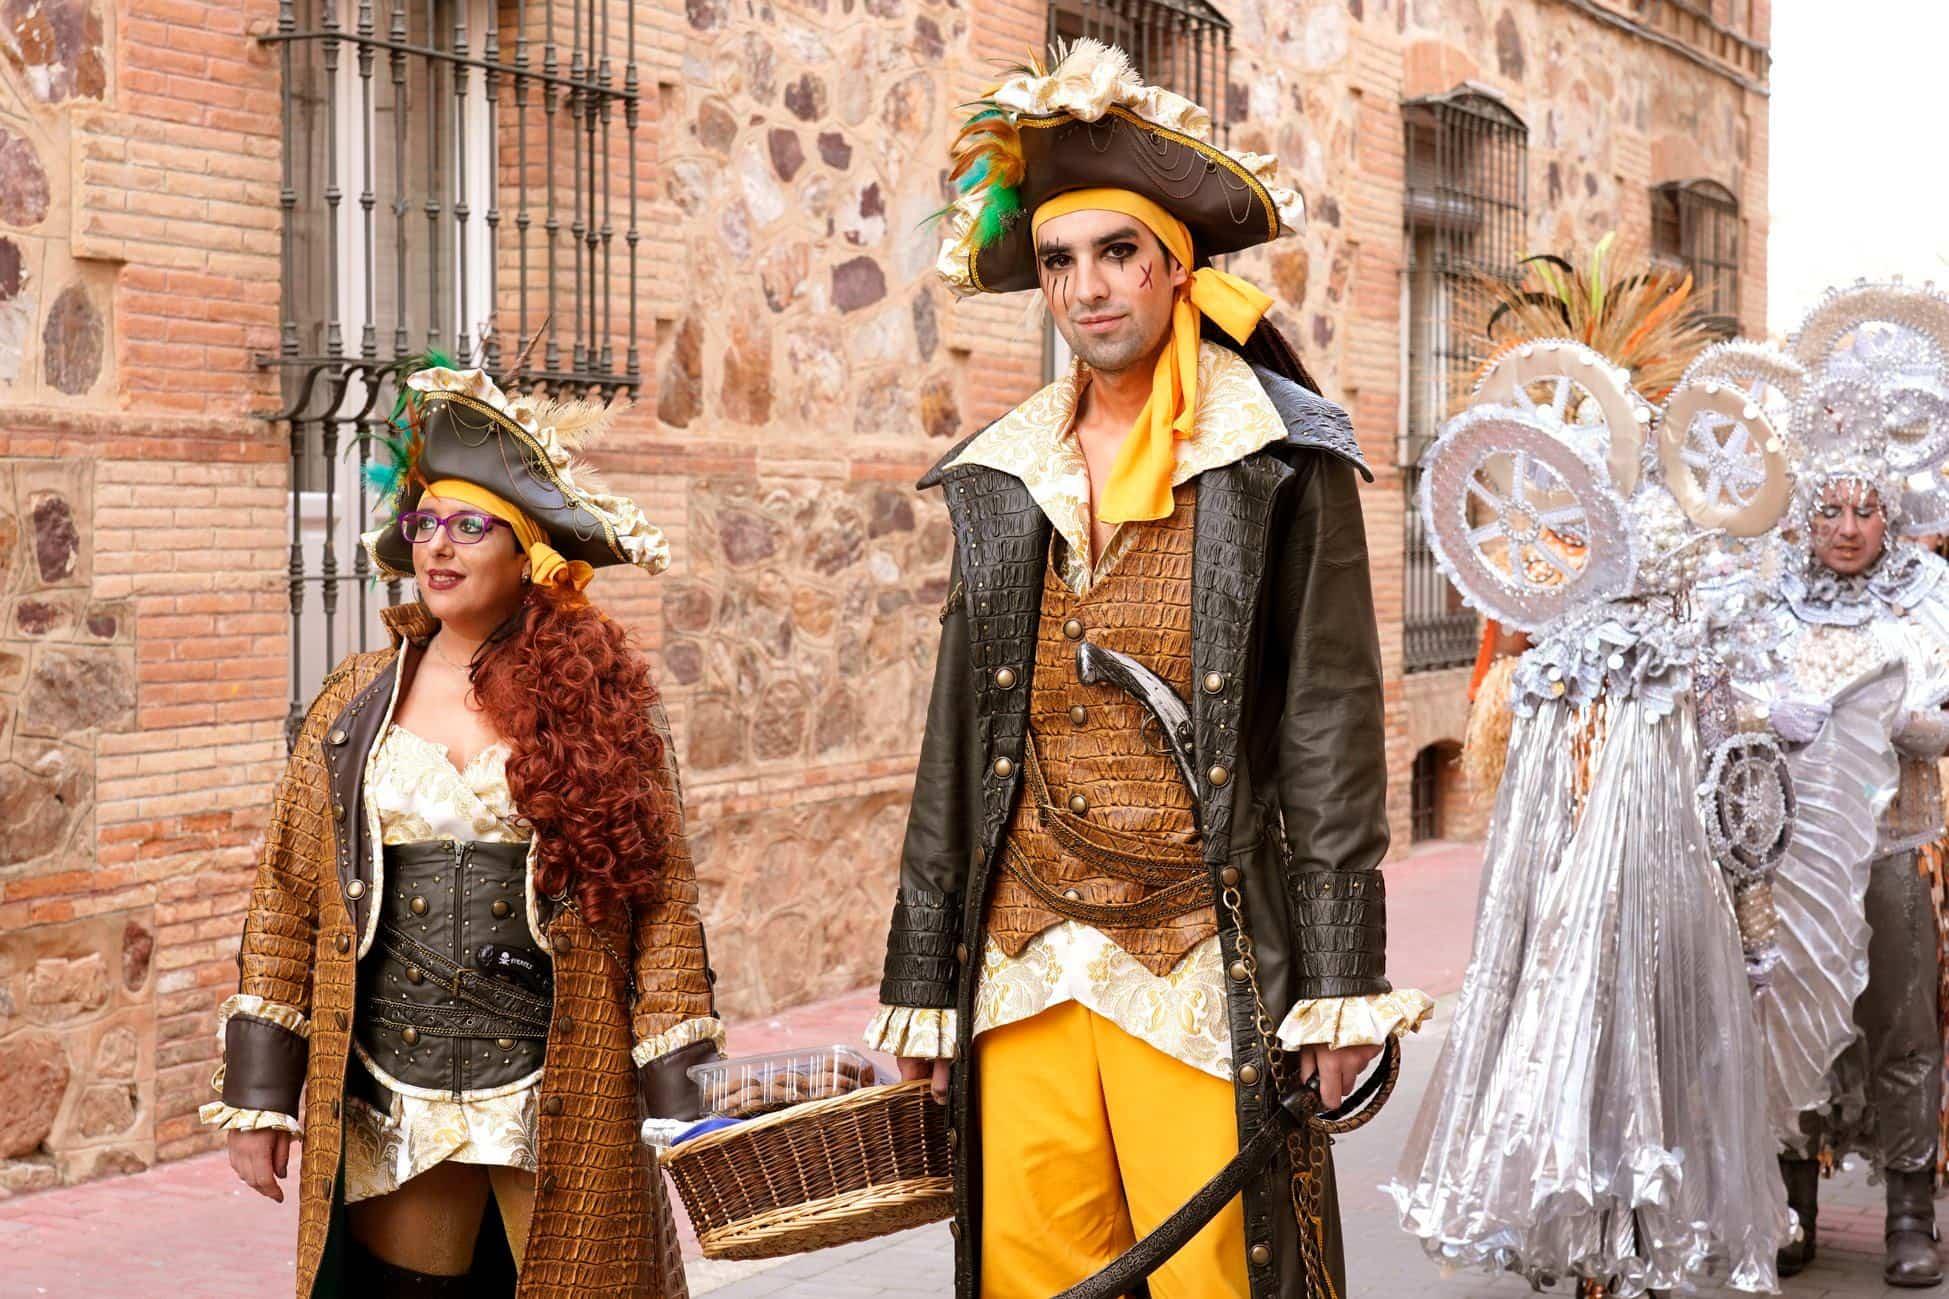 Carnaval de herencia 2020 ofertorio 74 - Selección de fotografías del Ofertorio del Carnaval de Herencia